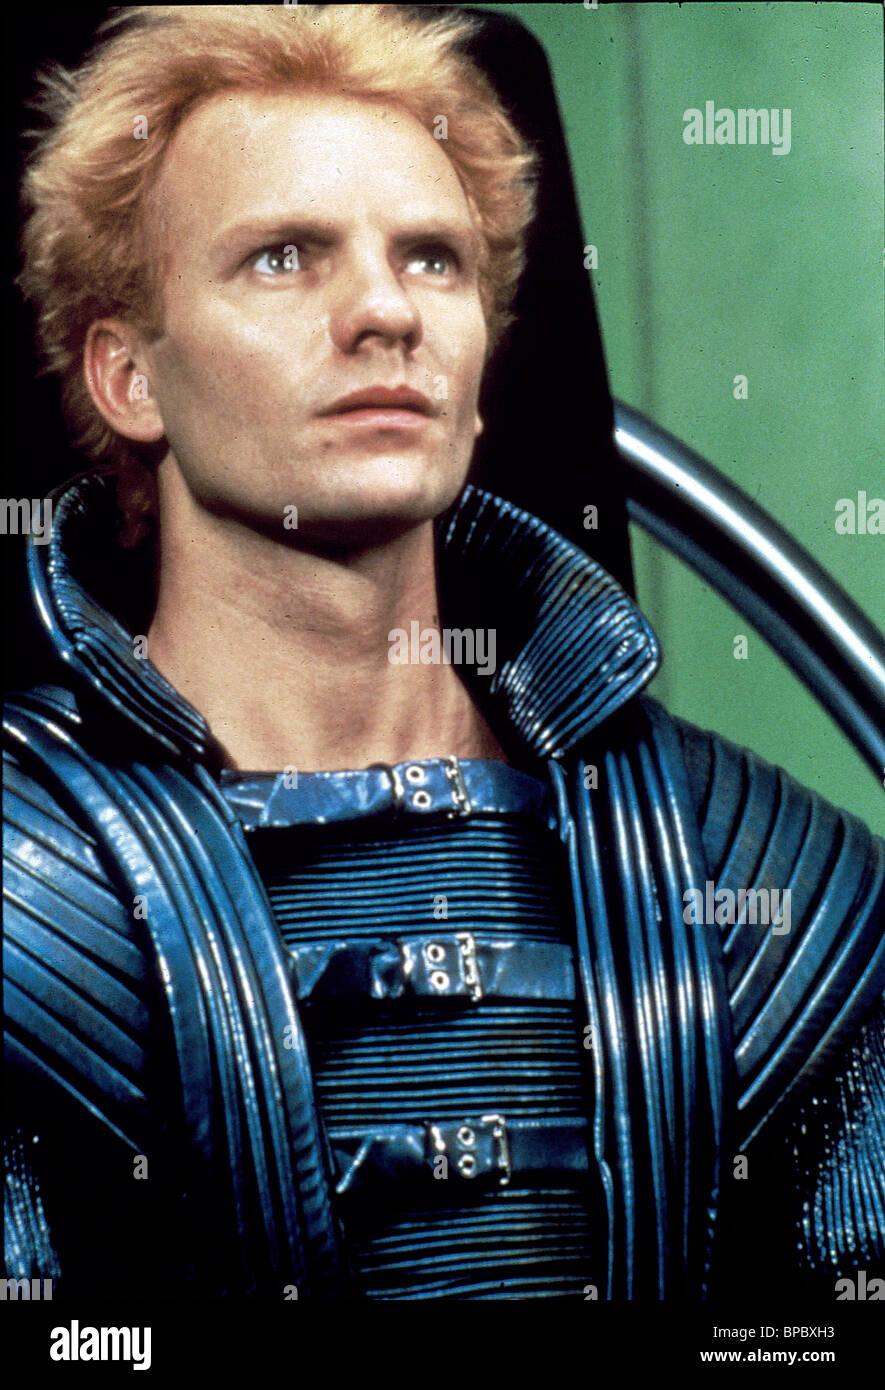 STING DUNE (1984) - Stock Image